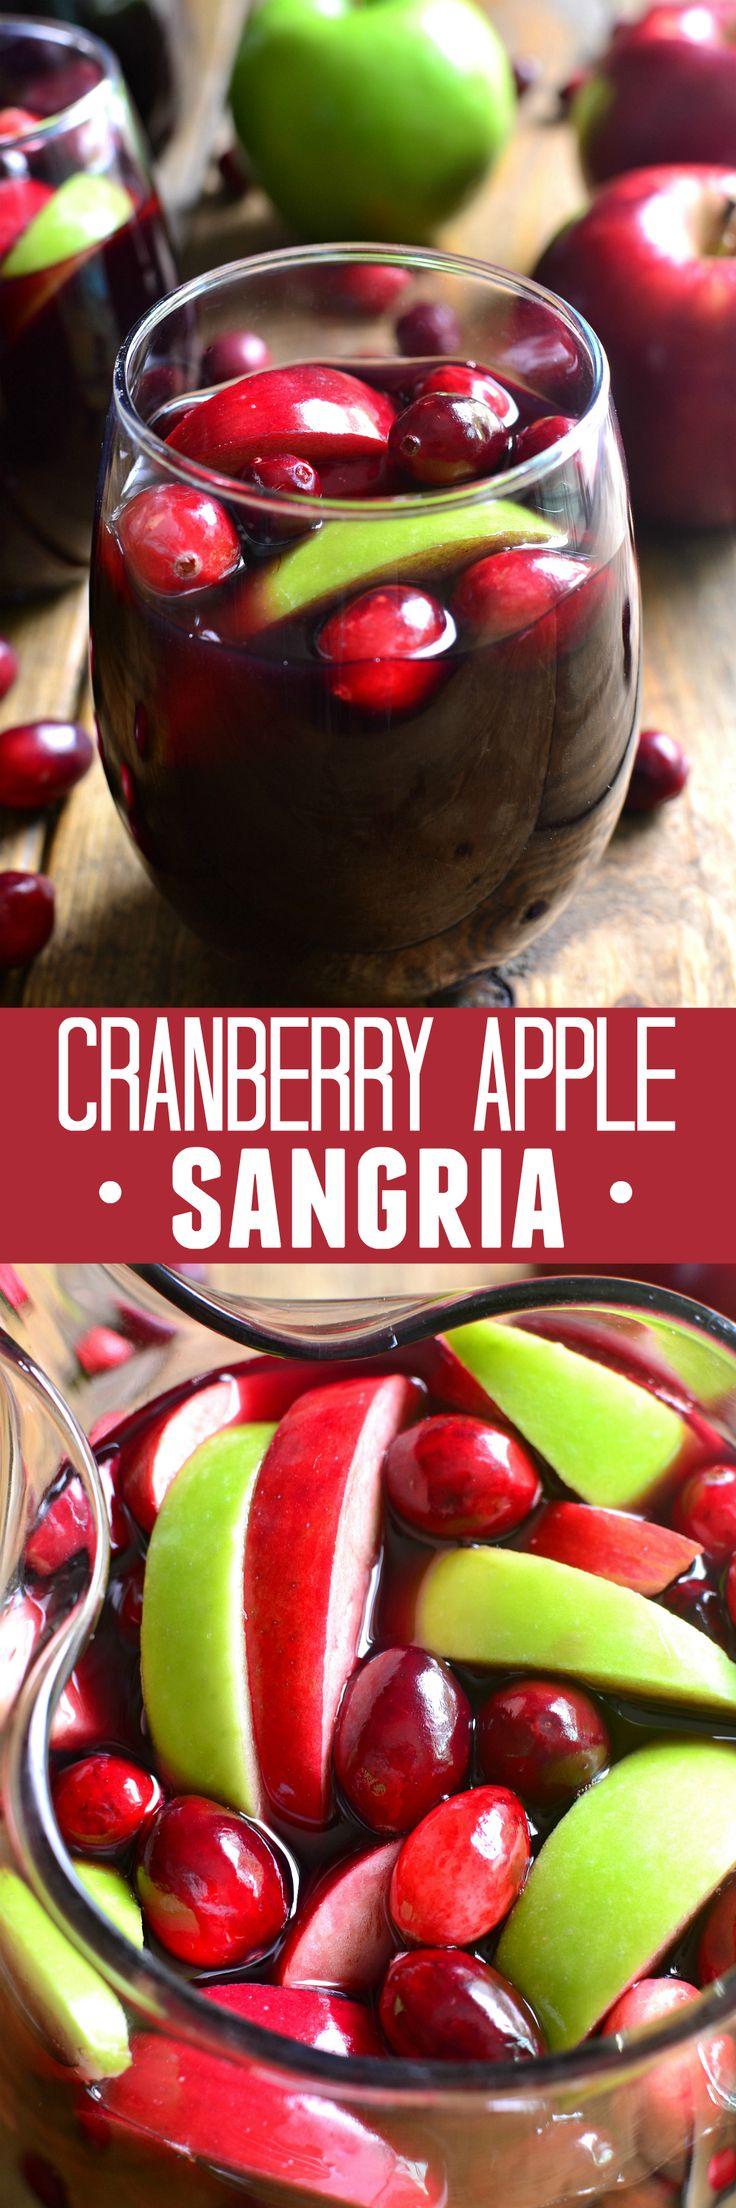 Cranberry Apple Sangria